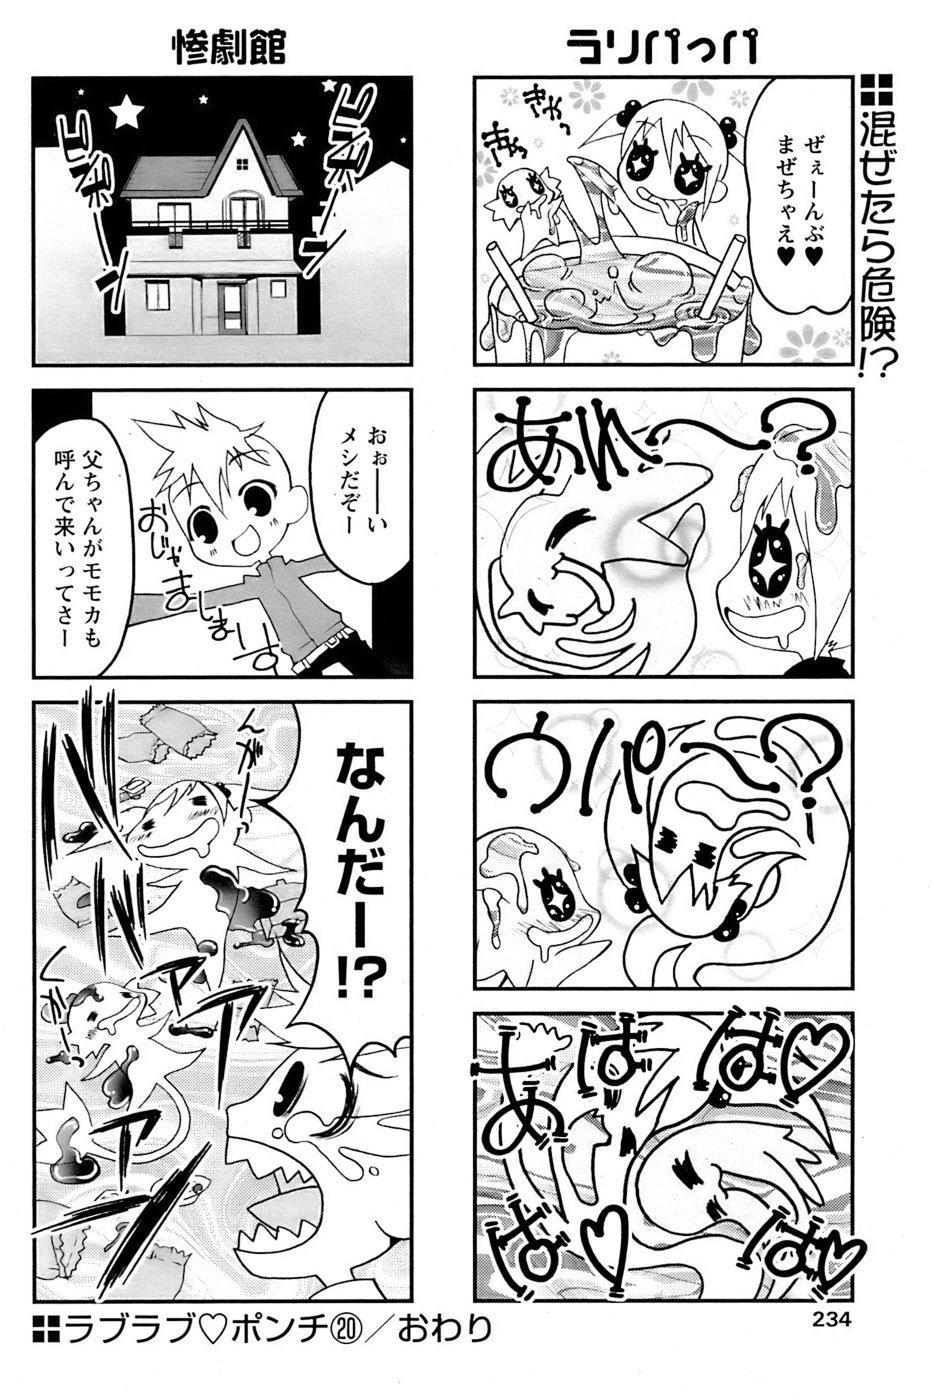 Comic Papipo 2007-01 229